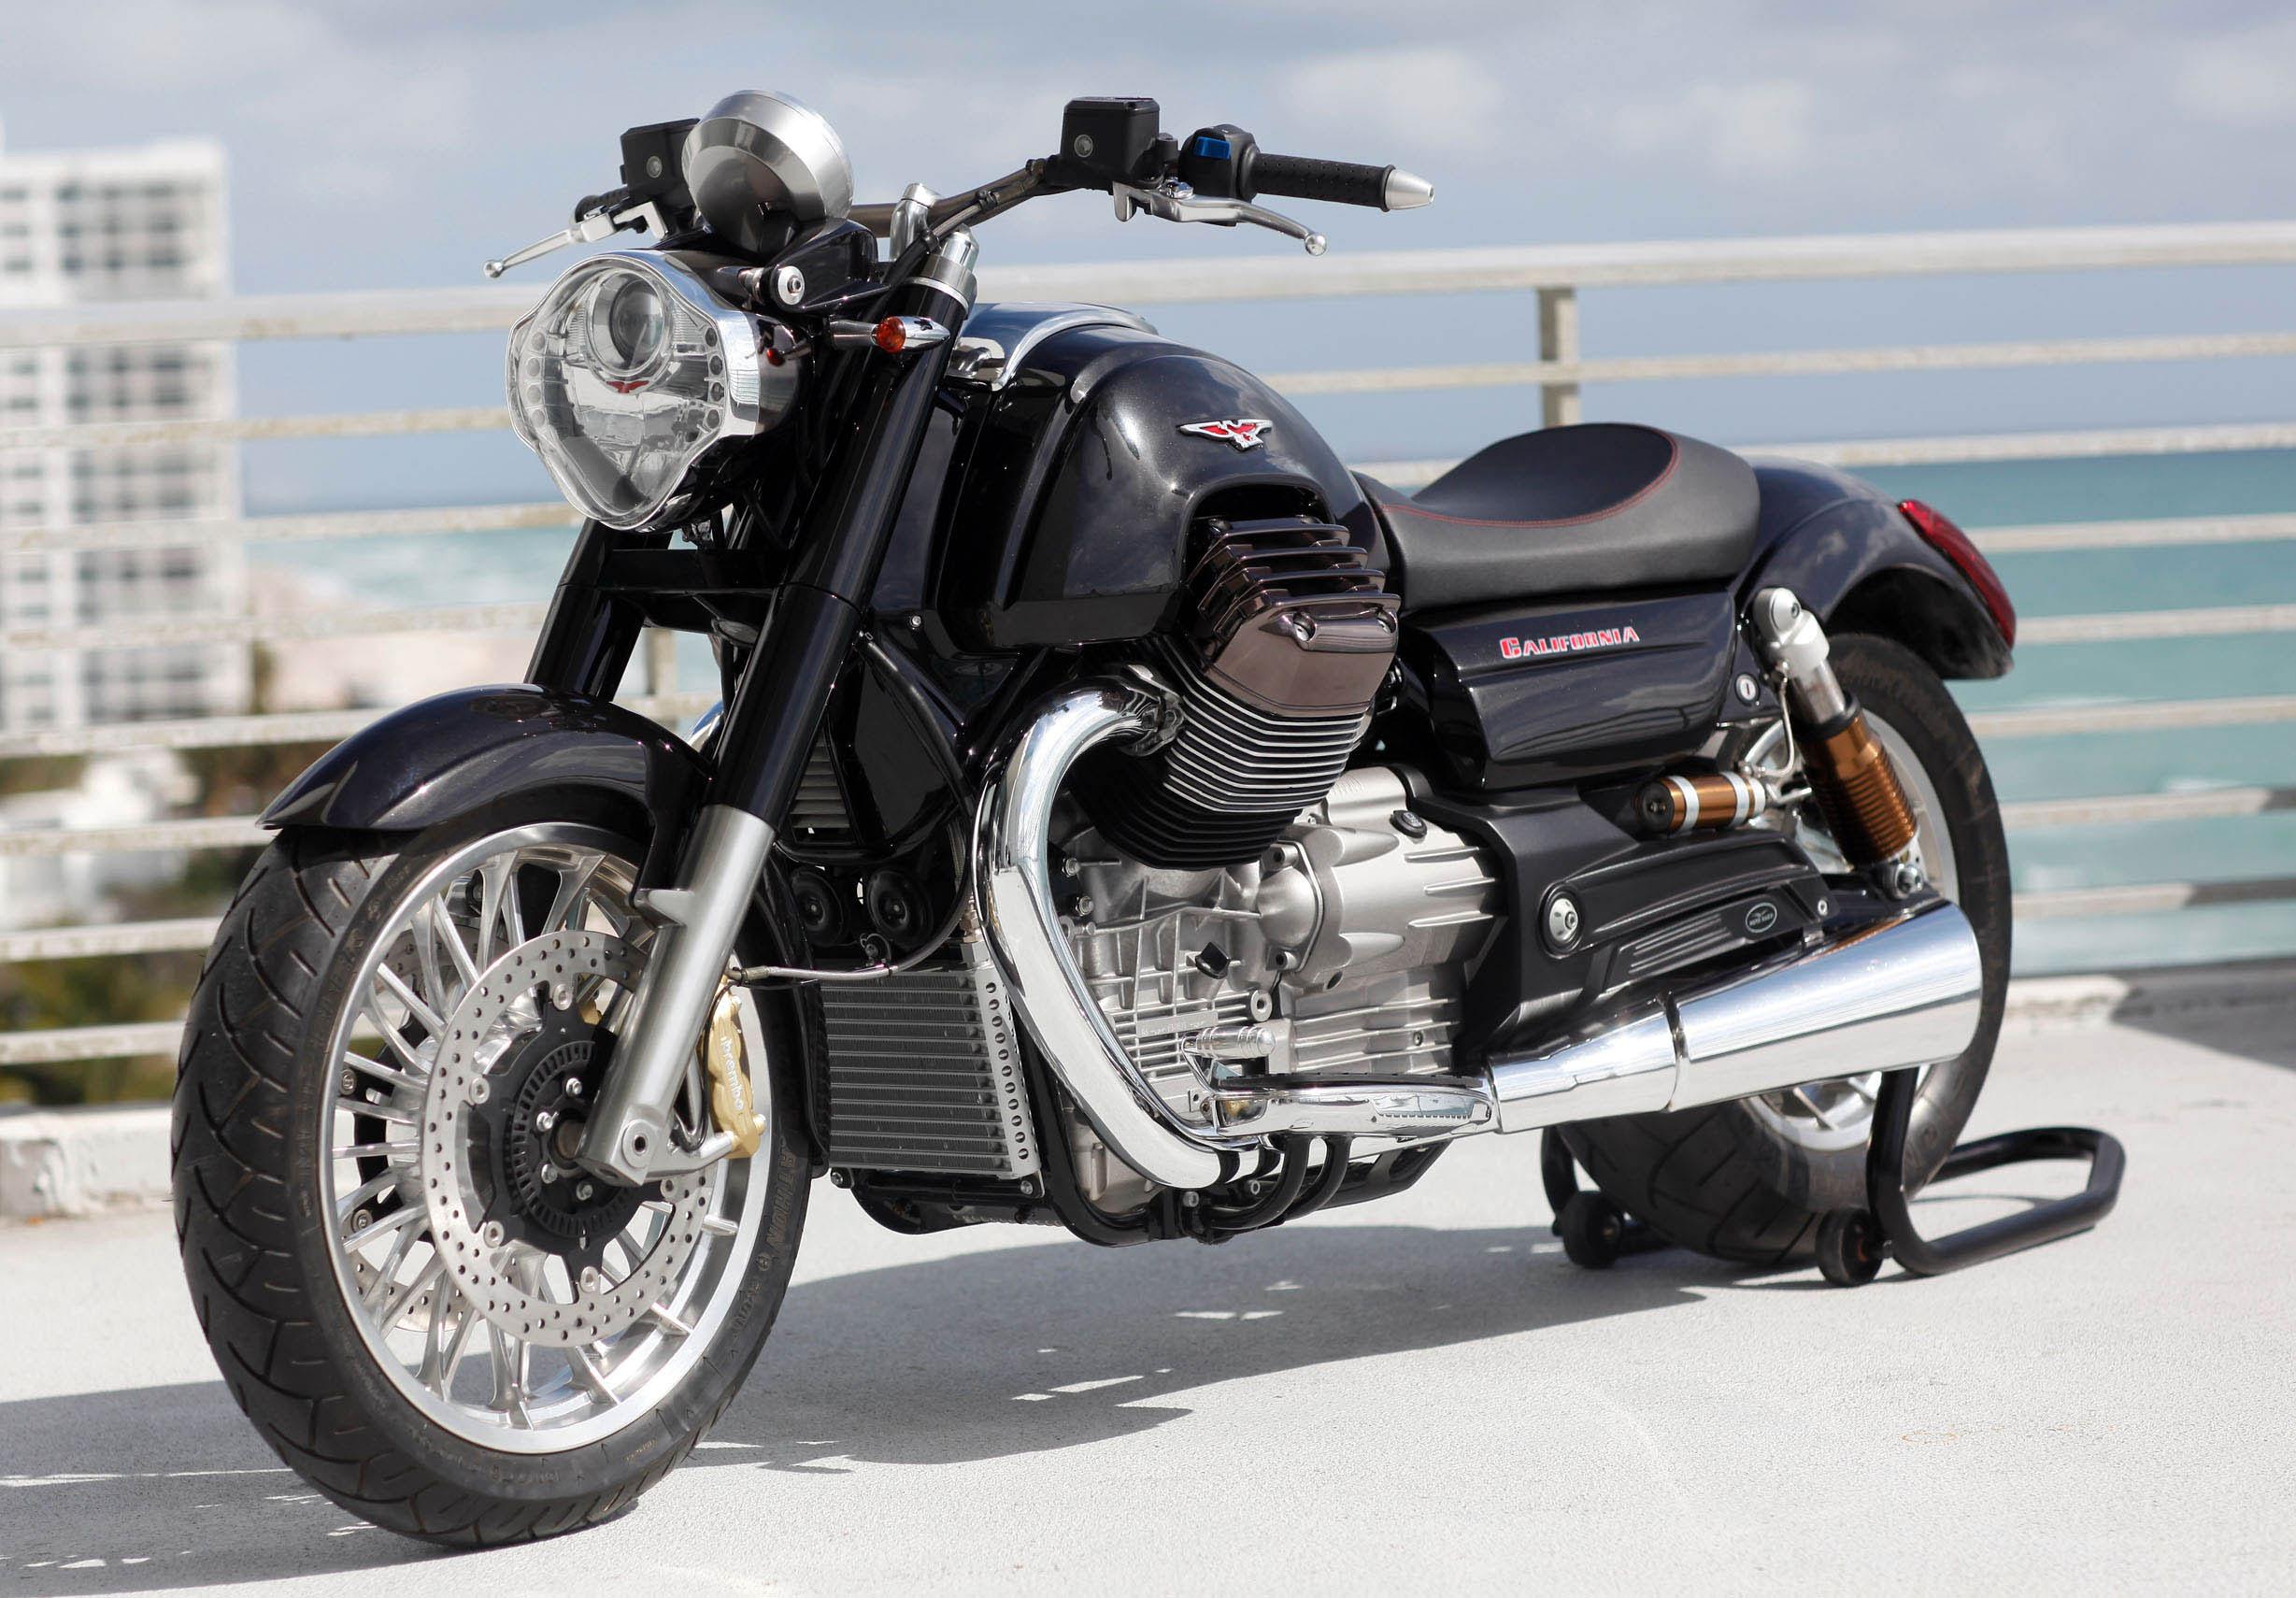 2013 moto guzzi california 1400 g wallpaper 2457x1710. Black Bedroom Furniture Sets. Home Design Ideas